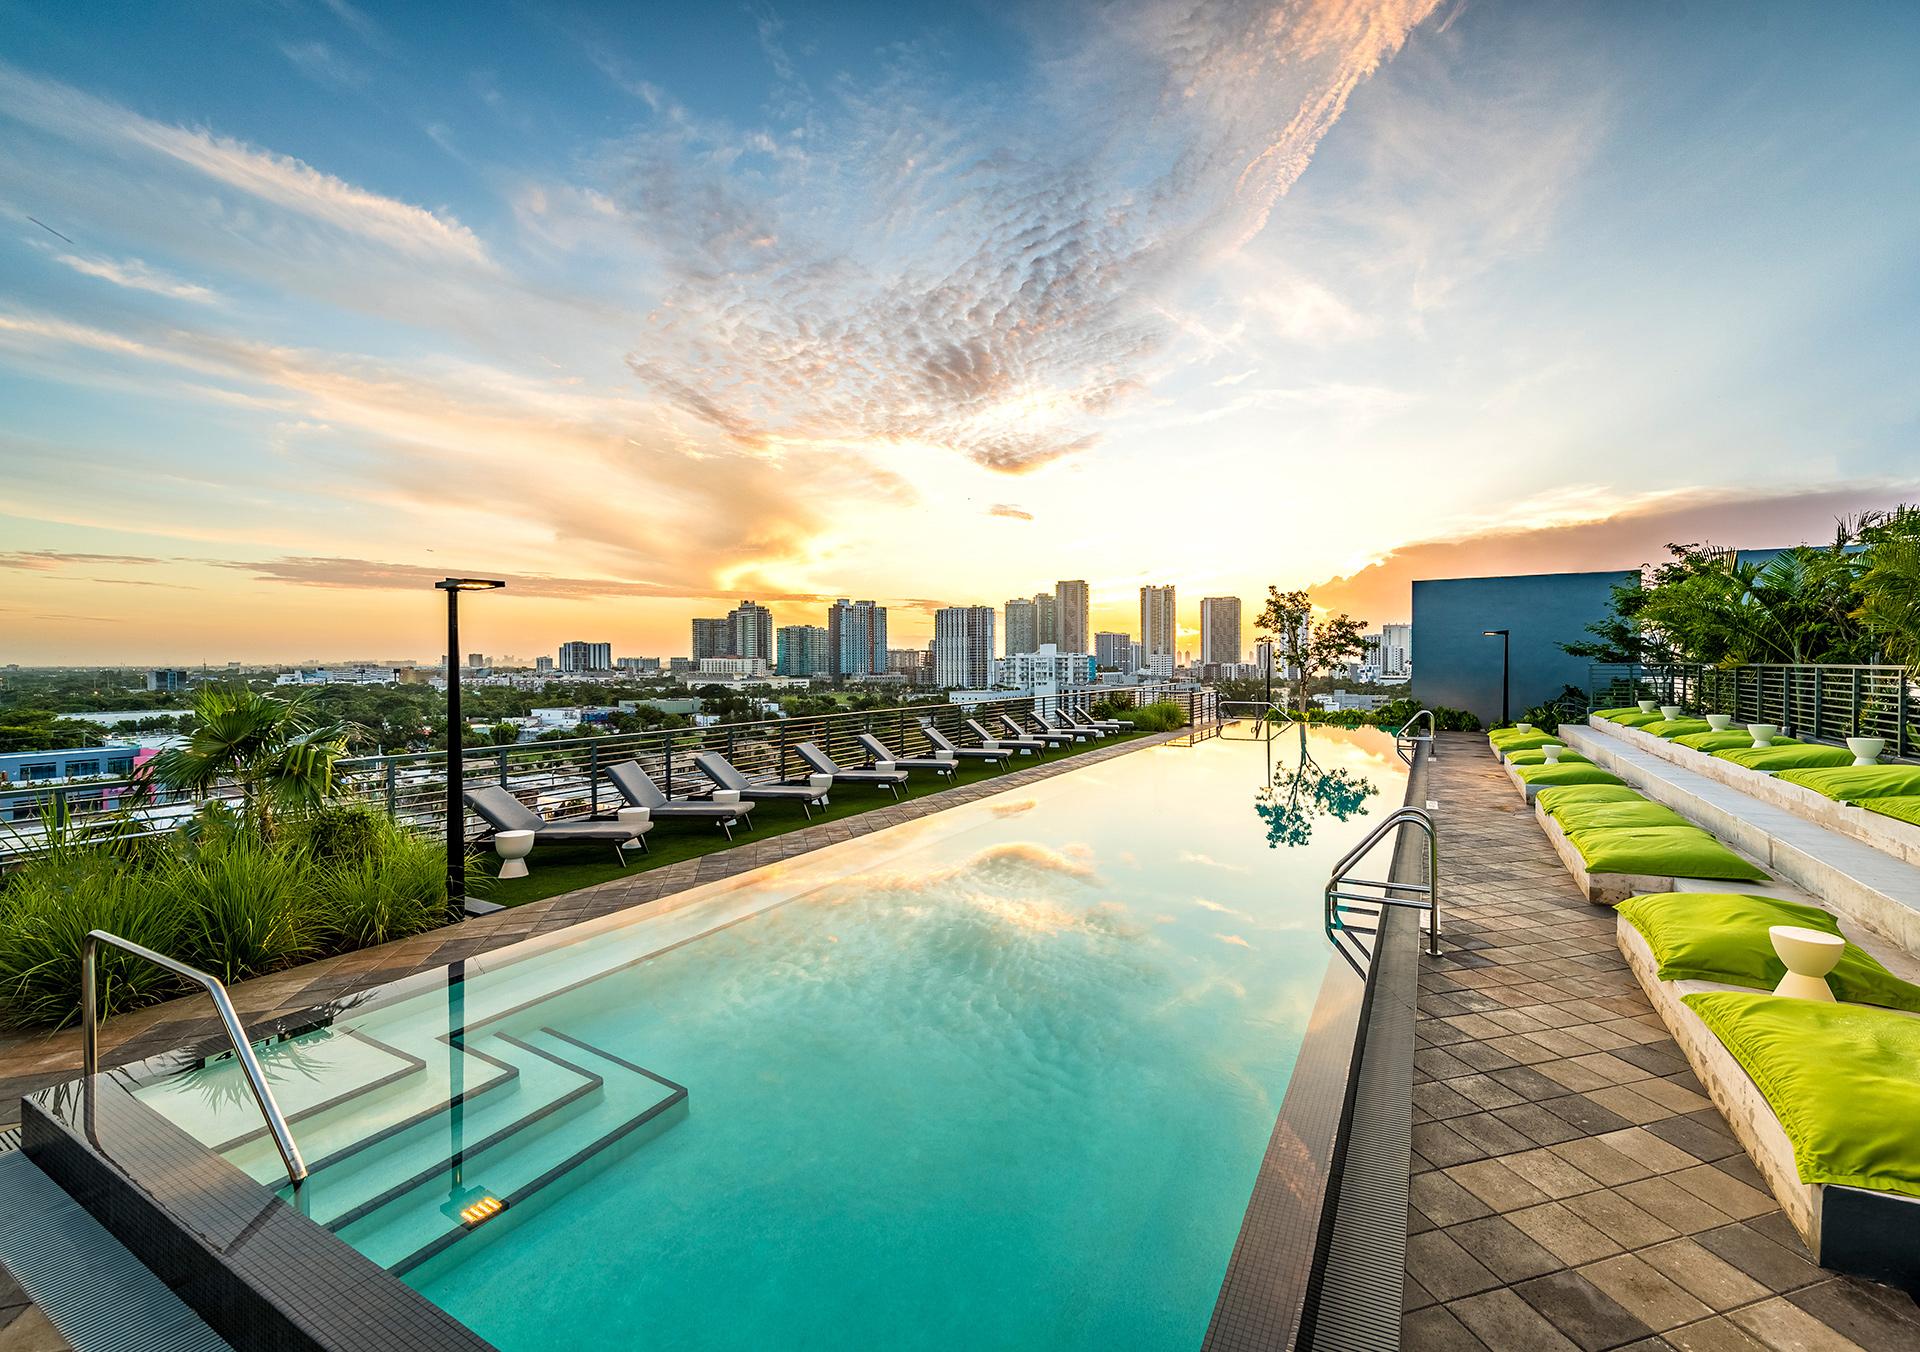 rooftop heated pool